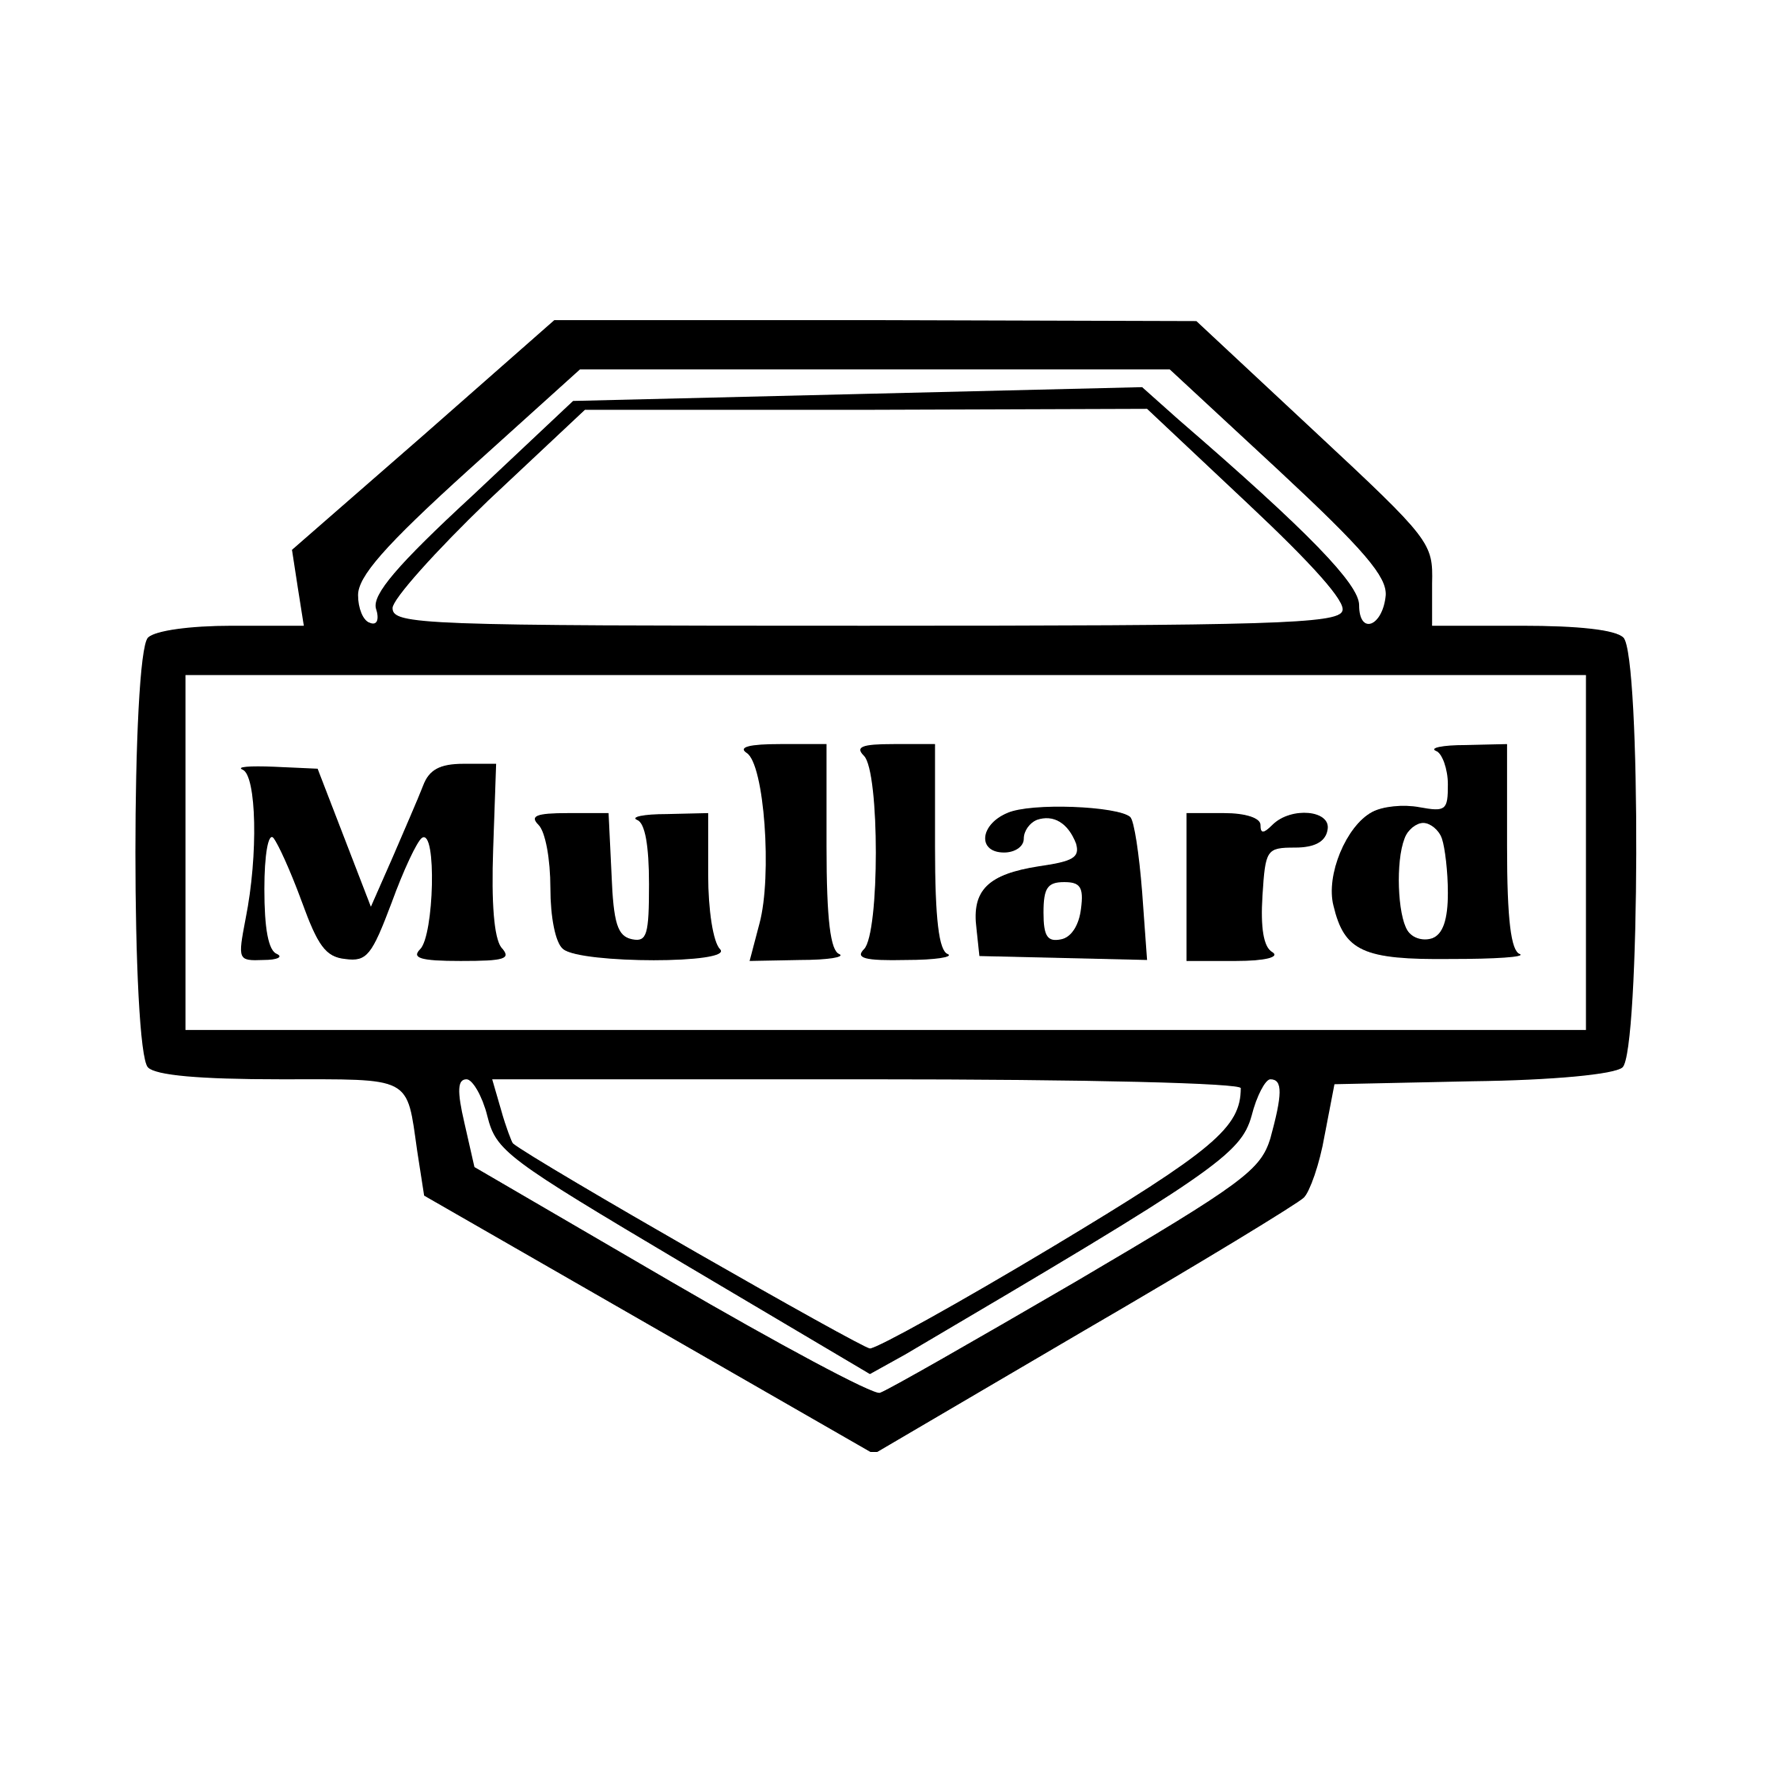 Mullard logo